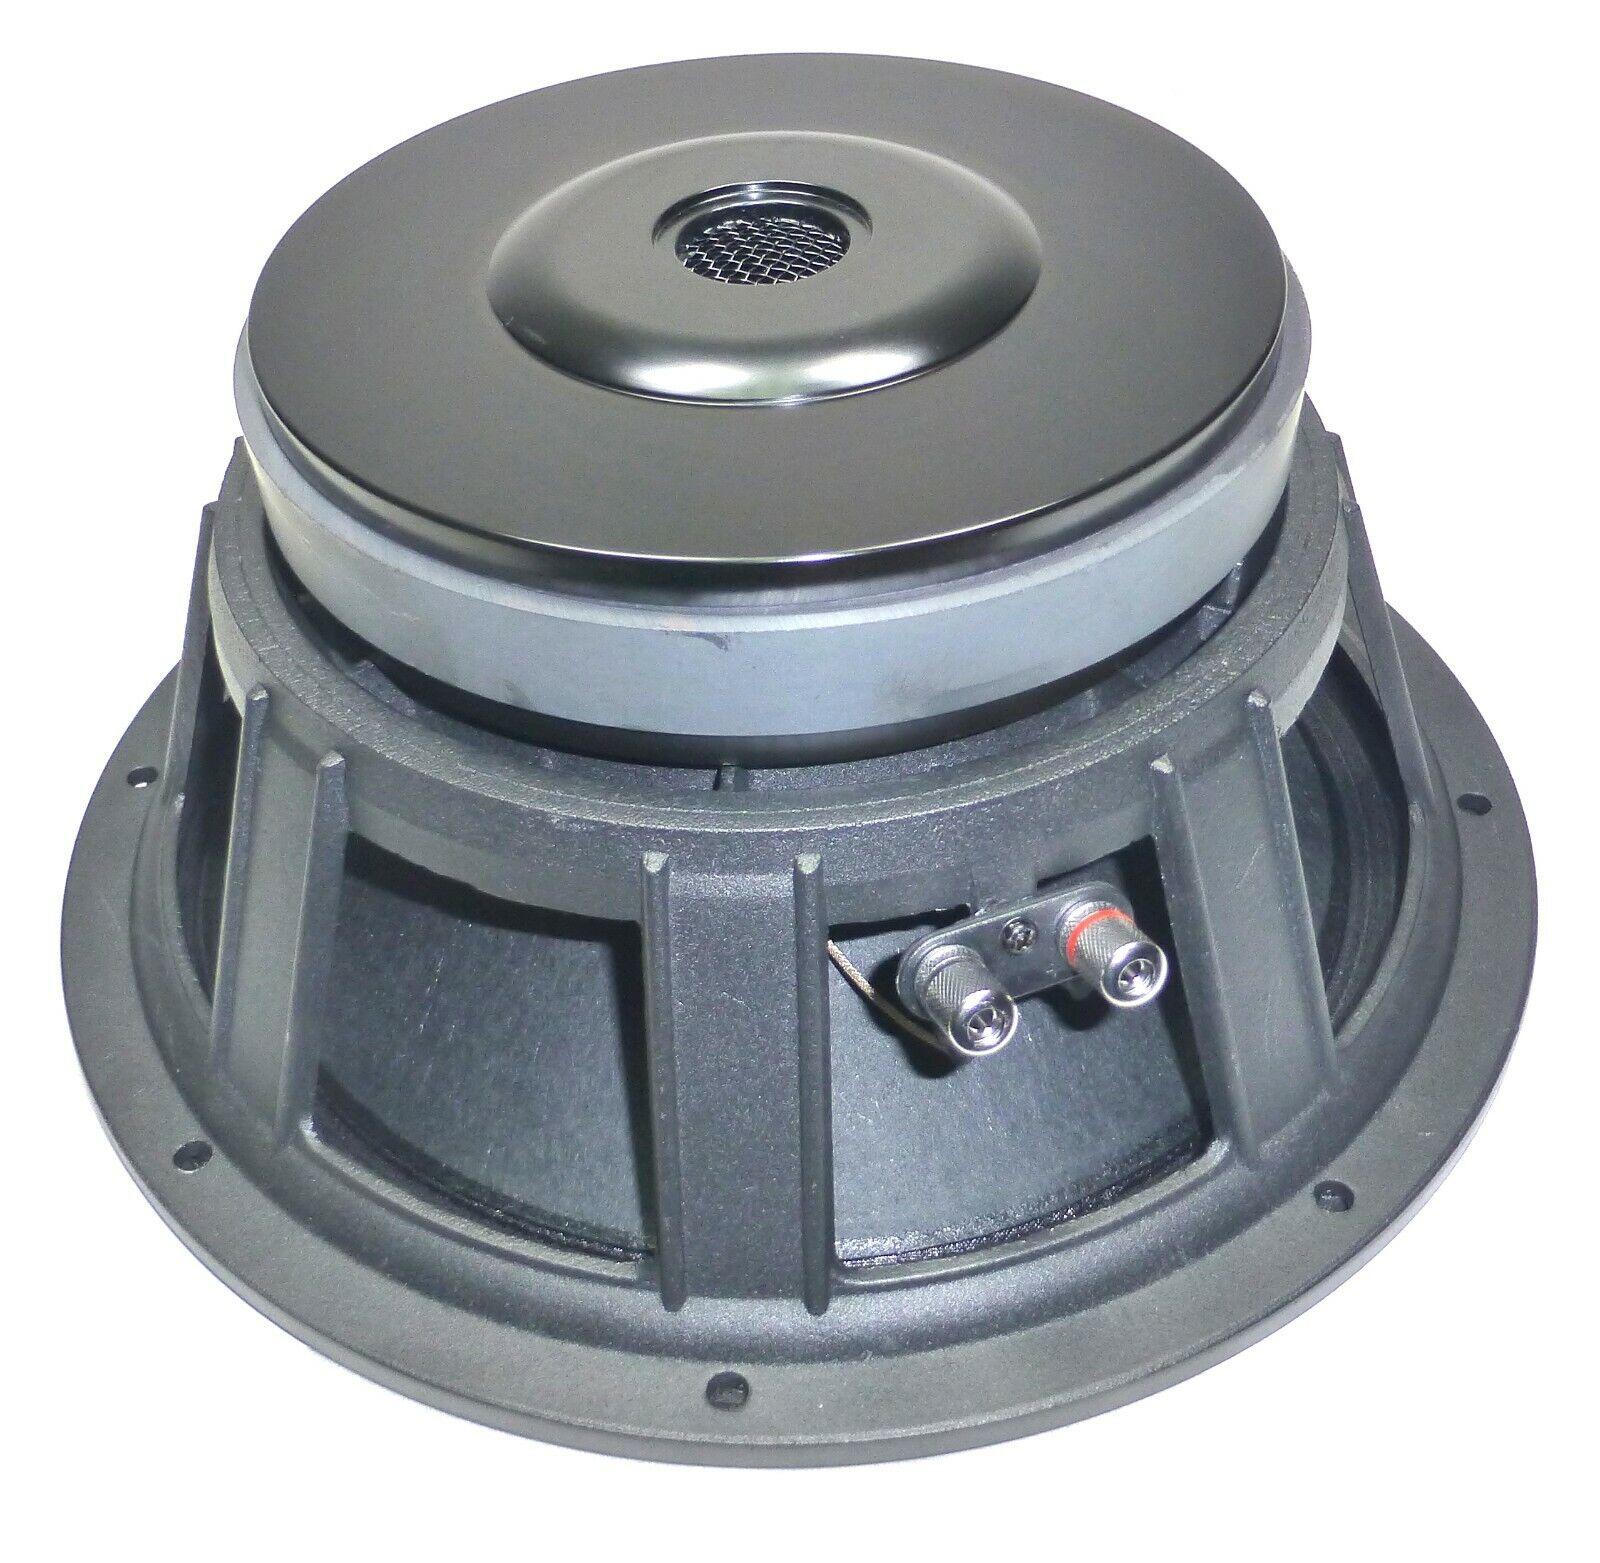 LASE PRO-12A - 12  Mid Bass Speaker 3  Voice Coil 8 ohms